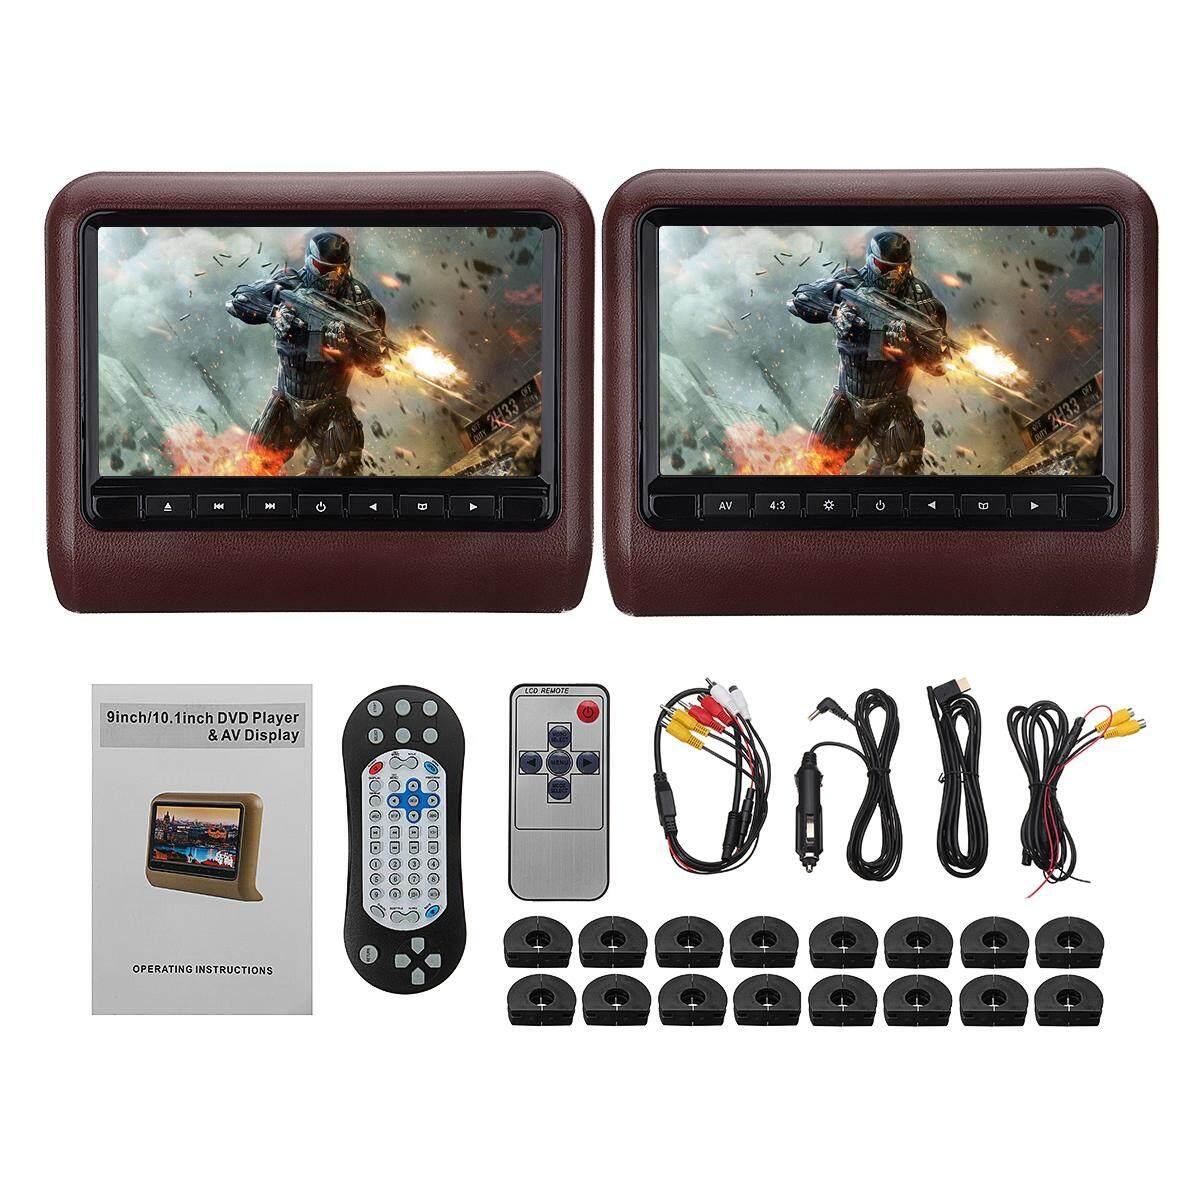 9 Inch Digital Lcd Universal Car Dvd+av Headrest Monitor Player Remote Control By Audew.